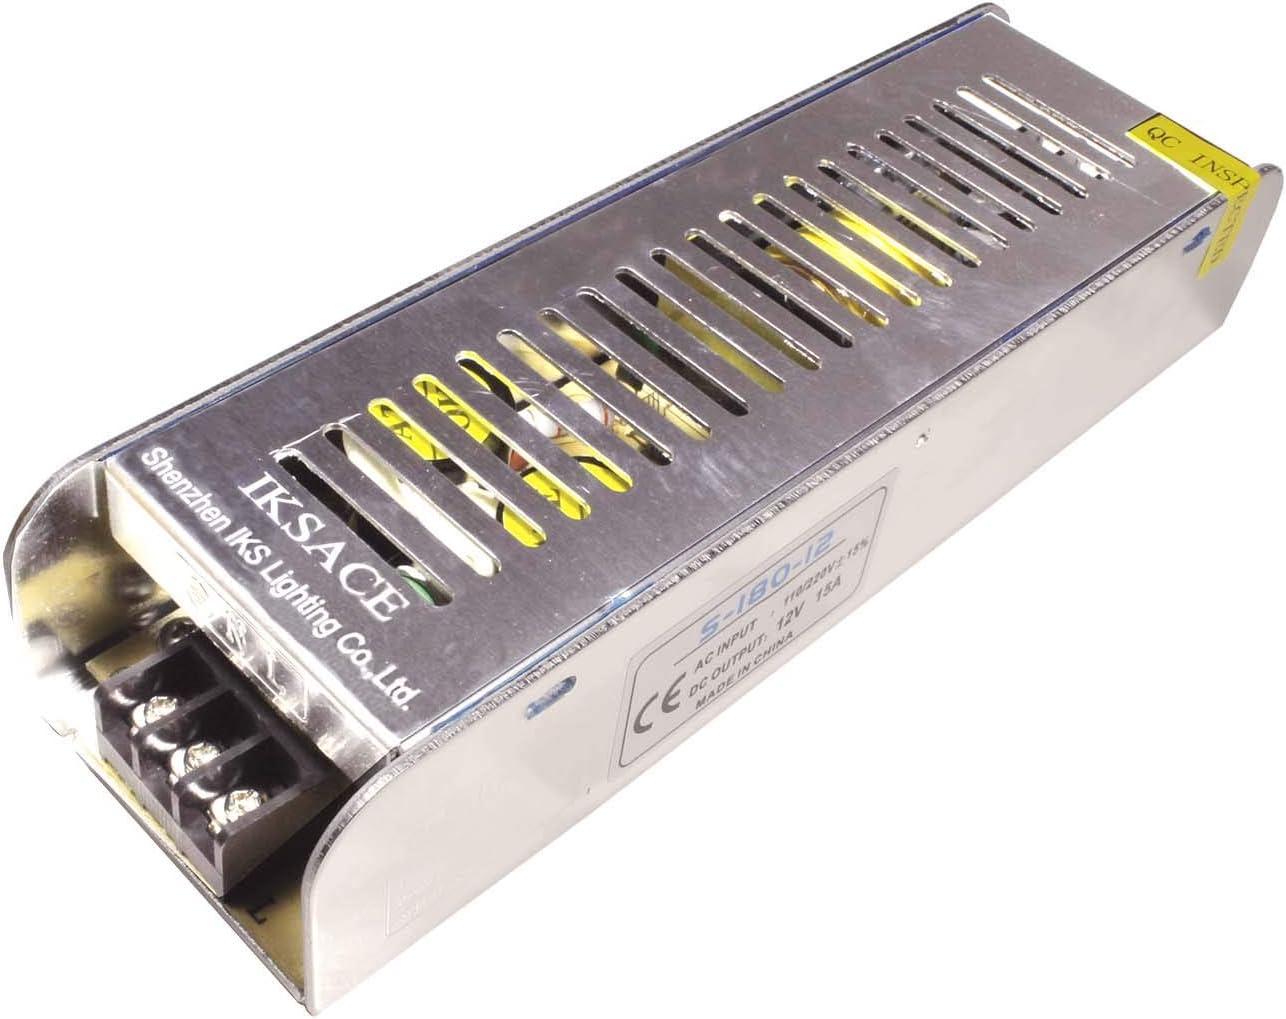 IKSACE DC12V LED transformador controlador de fuente de alimentaci/ón adaptador para tira de luces